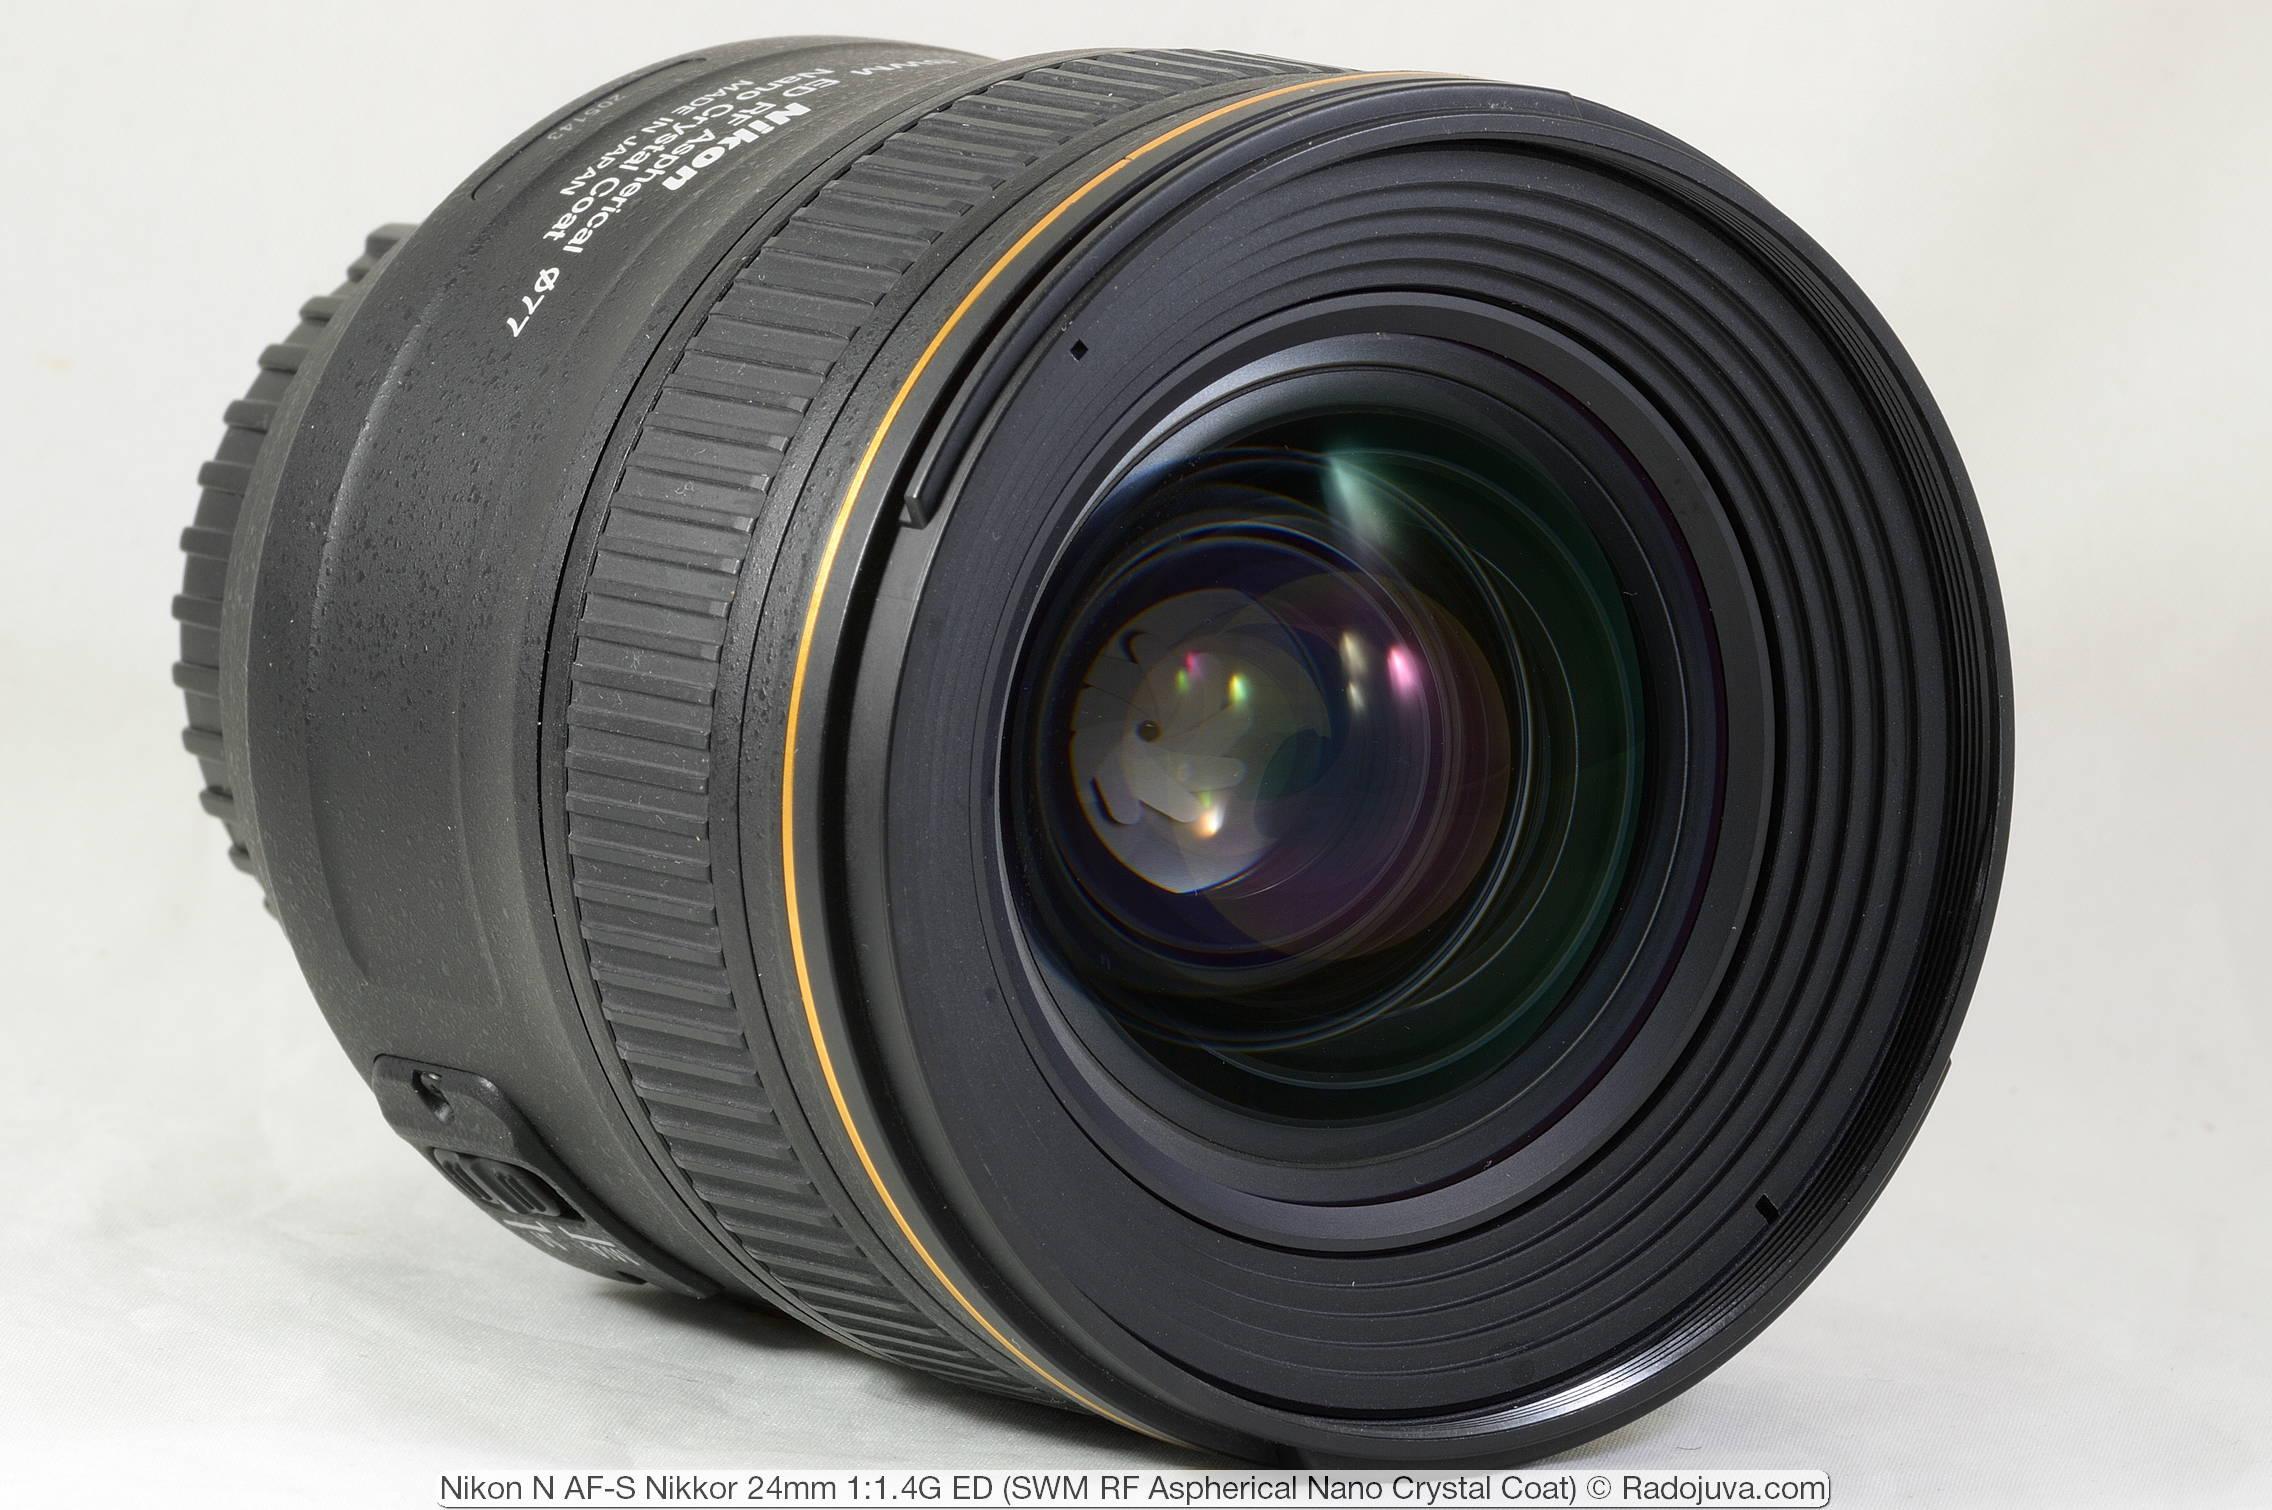 Nikon N AF-S Nikkor 24mm 1:1.4G ED (SWM RF Aspherical Nano Crystal Coat)